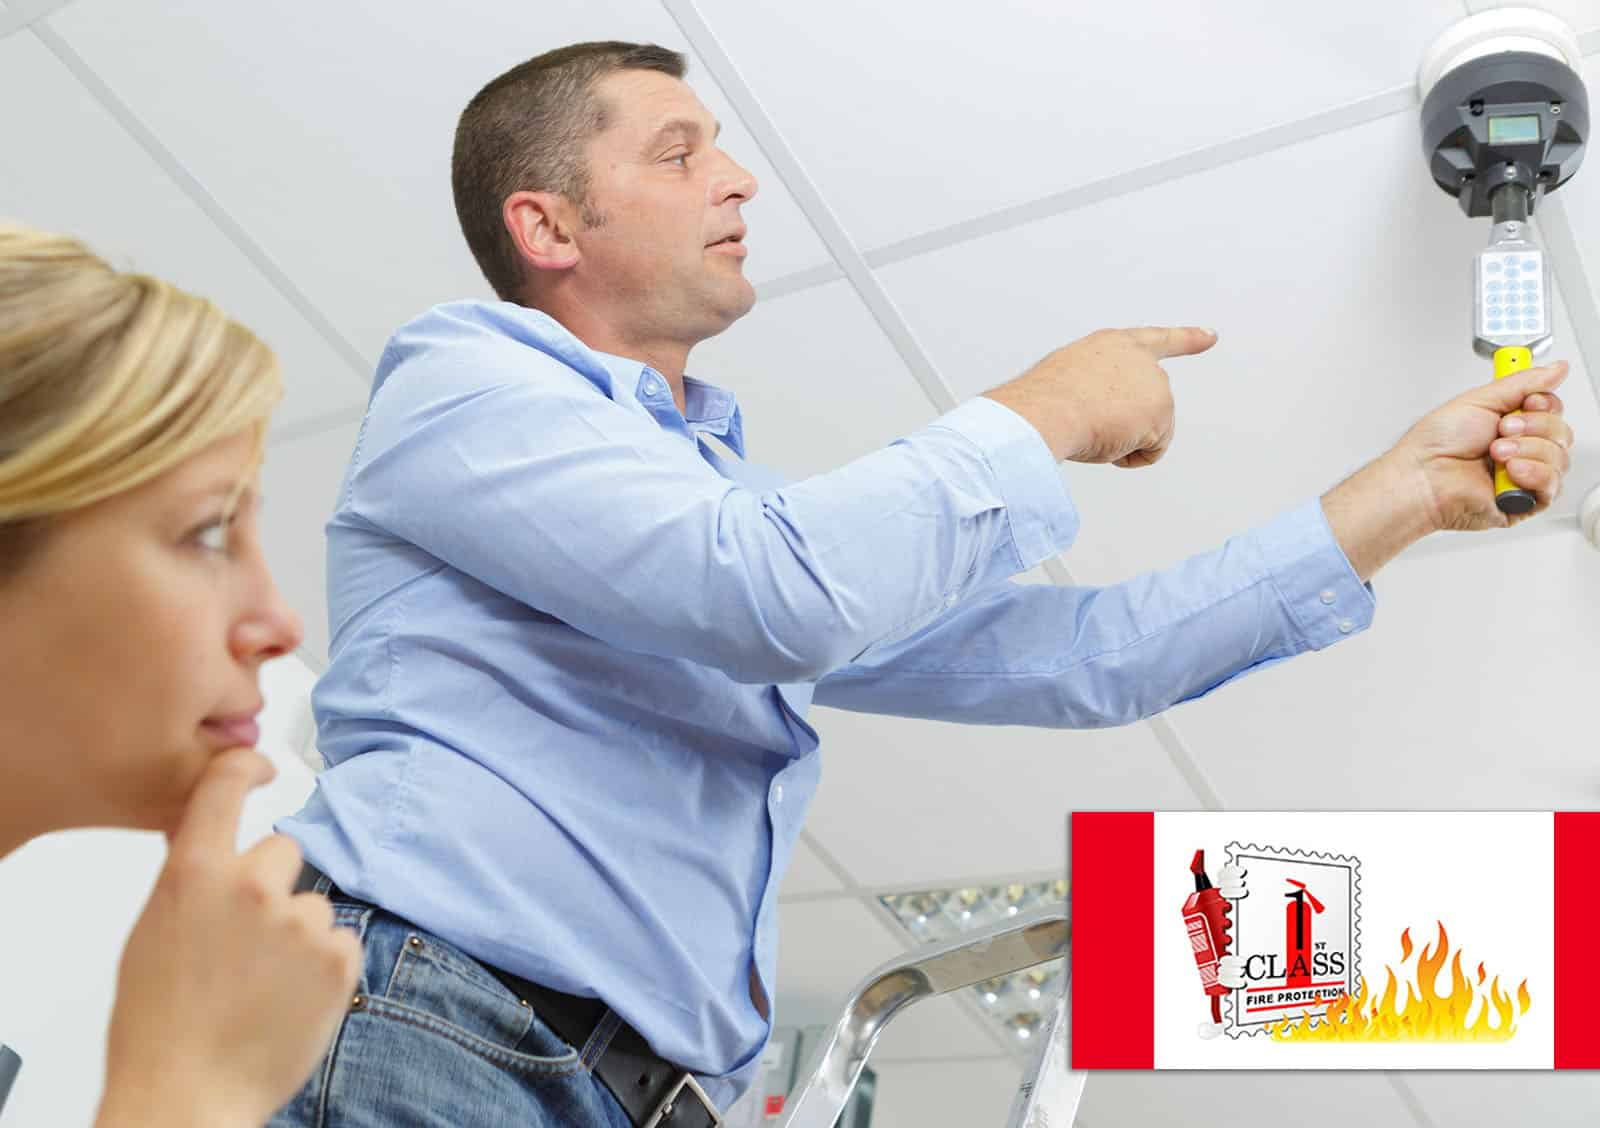 Fire Alarm Regulations Testing System